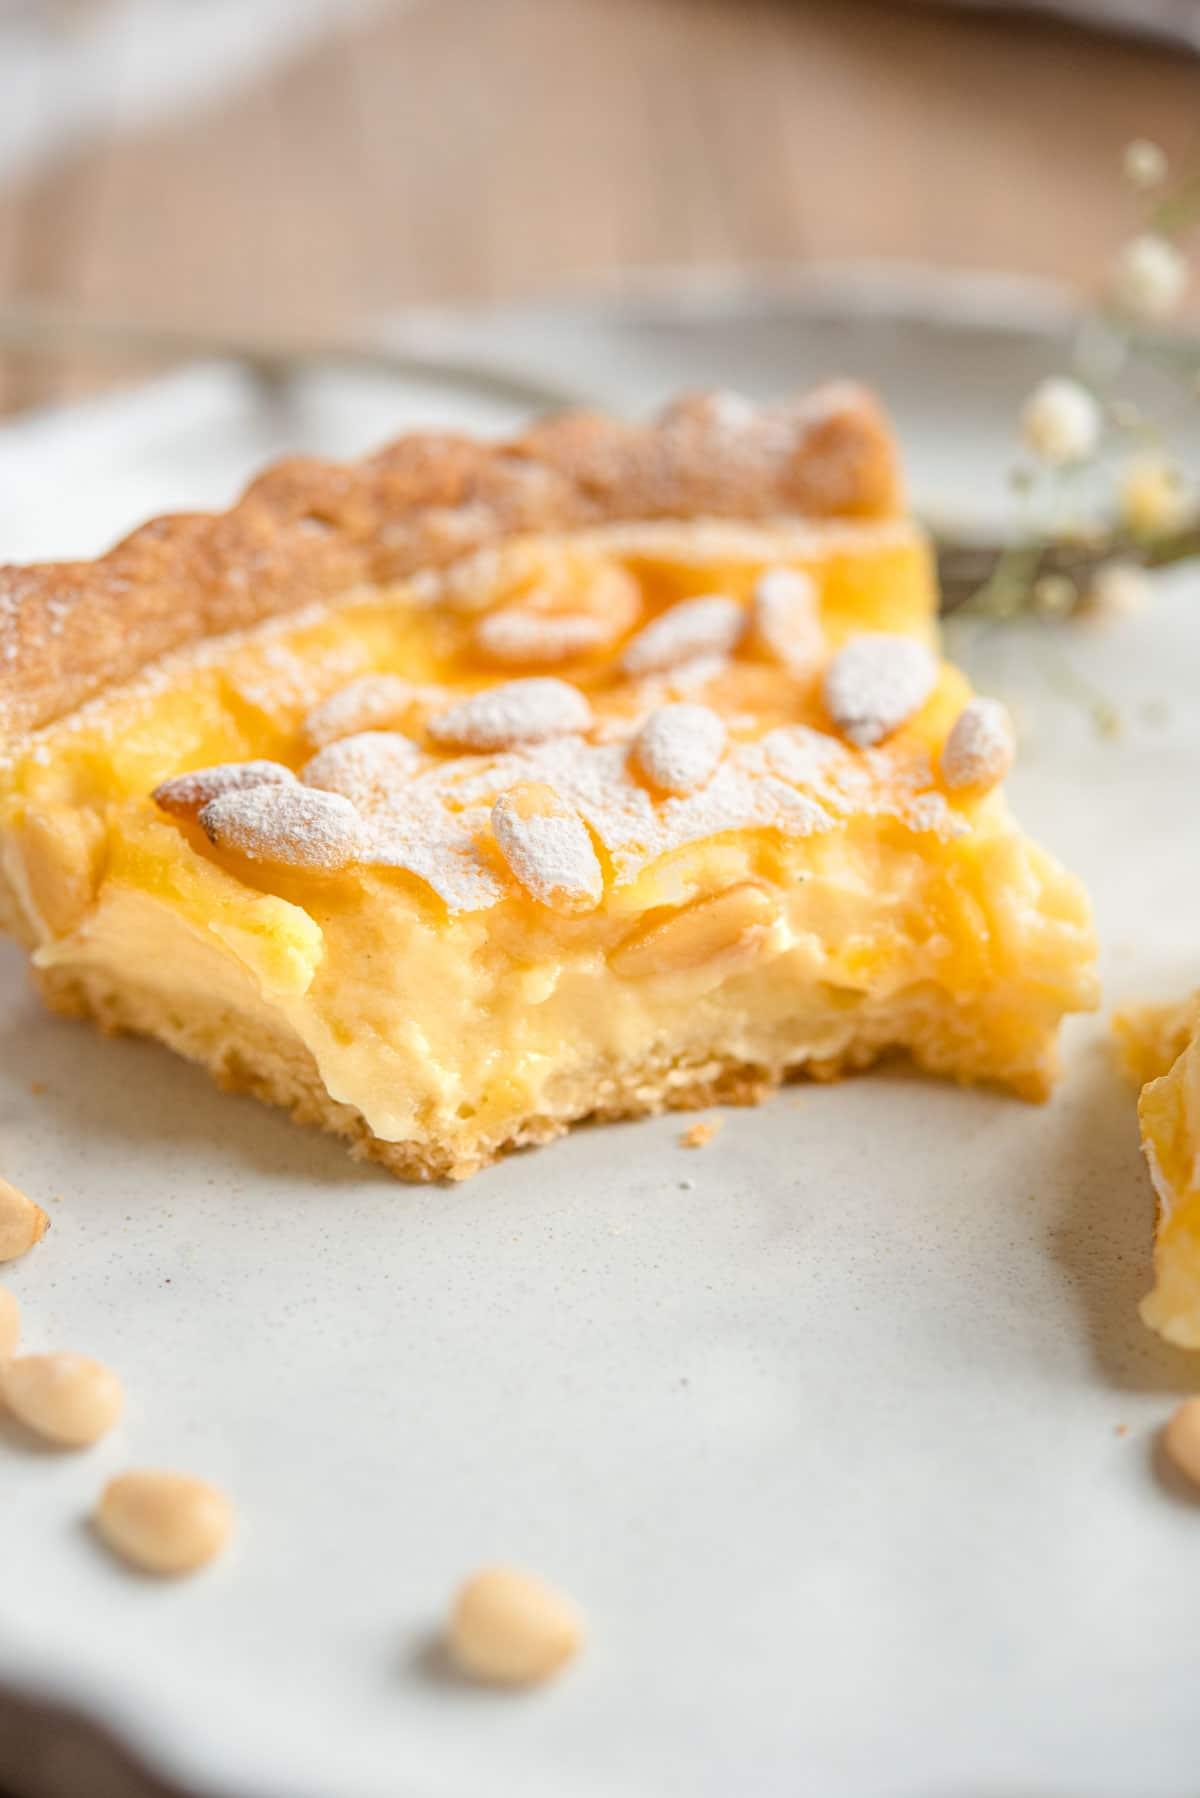 A close up of a slice of torta della nonna with a bite out